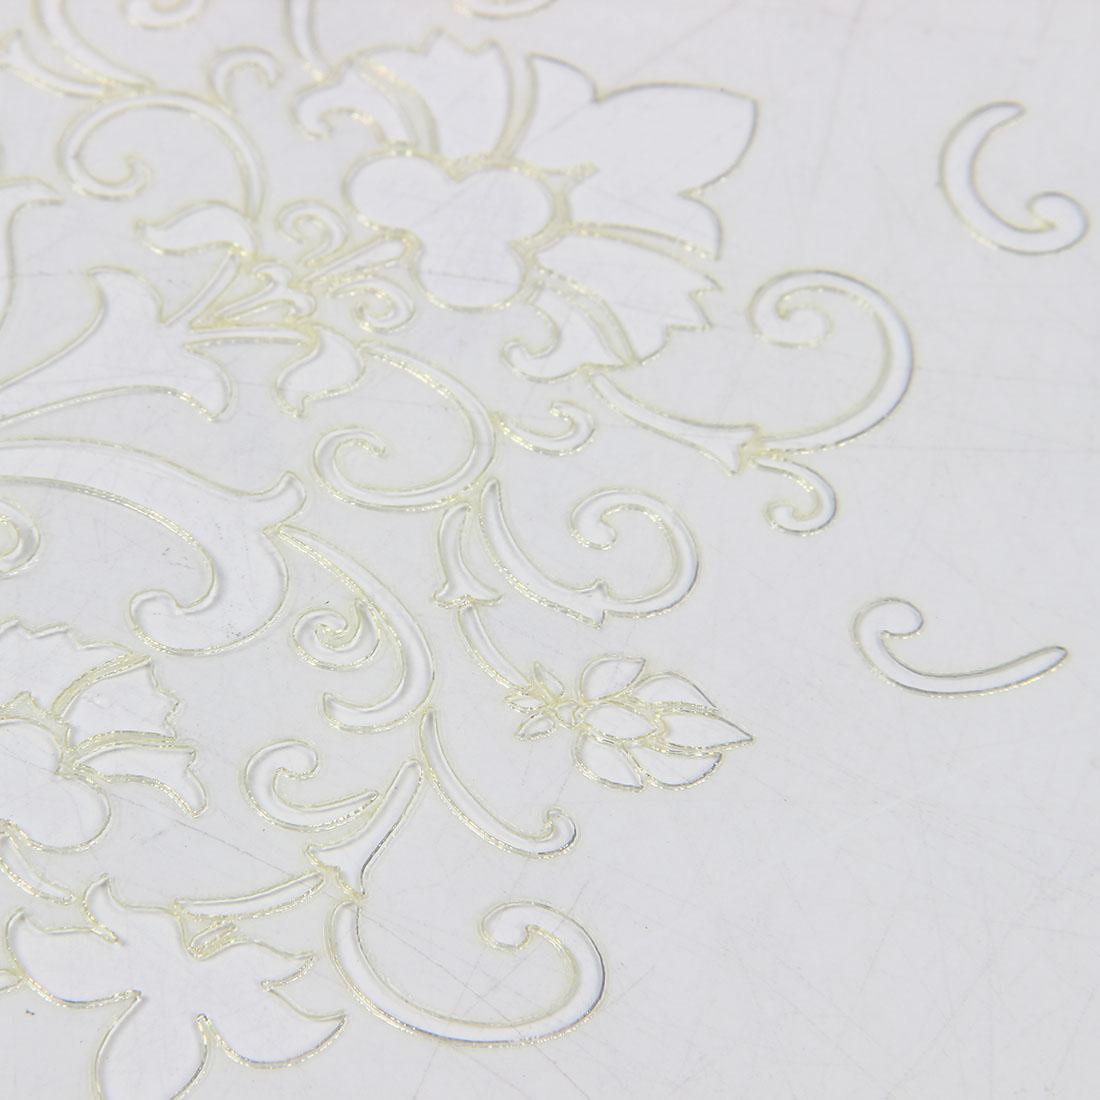 kieselalge schlamm wandmalerei schablonenmuster 21 29 cm de ebay. Black Bedroom Furniture Sets. Home Design Ideas